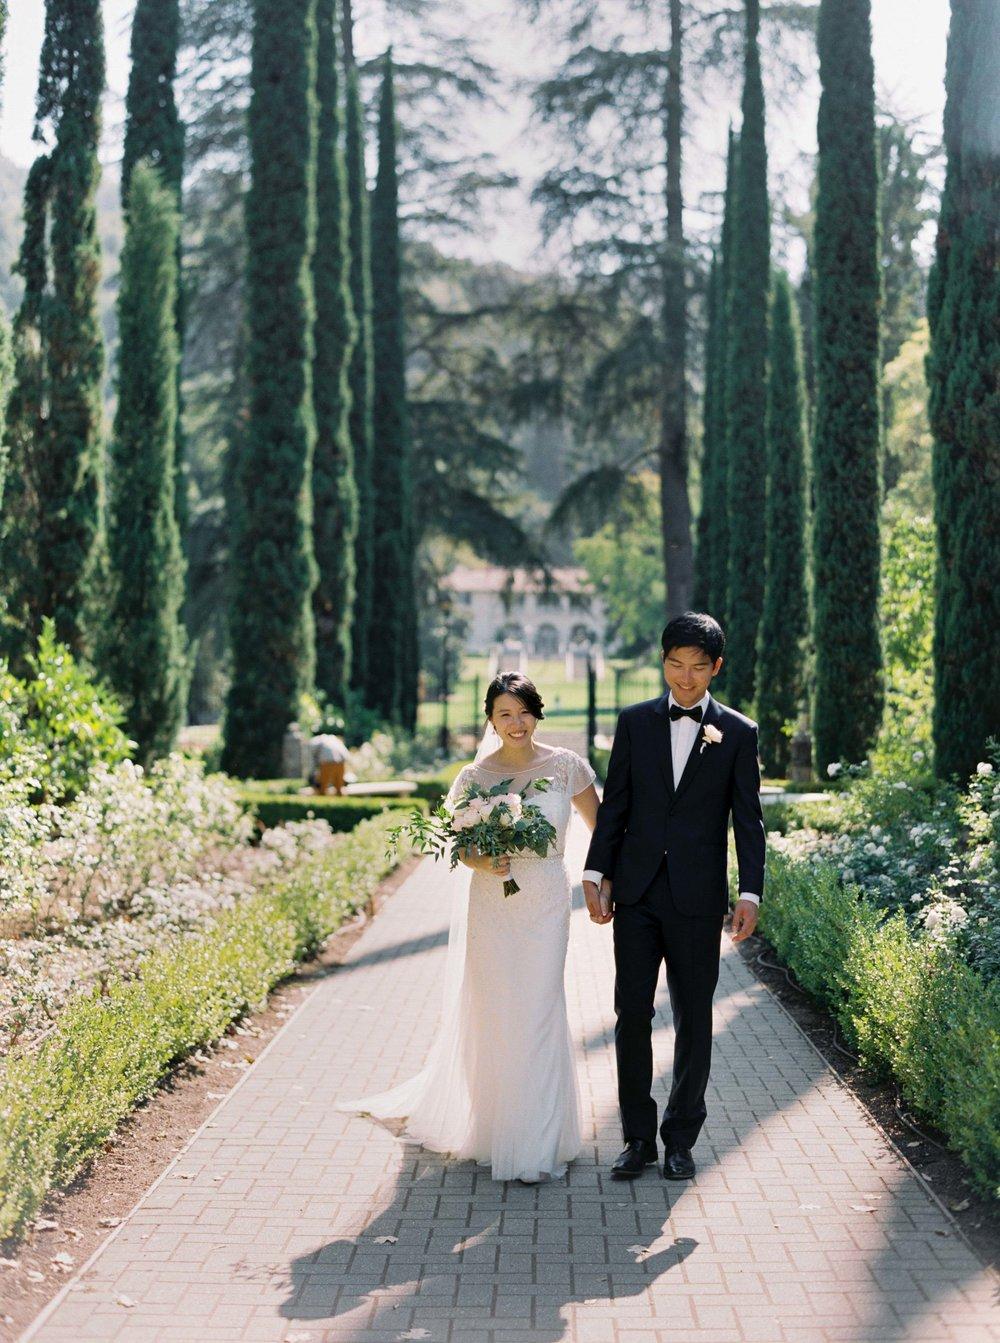 Villa_Montalvo_Wedding_Photographer_Videographer_San_Francisco081.jpg